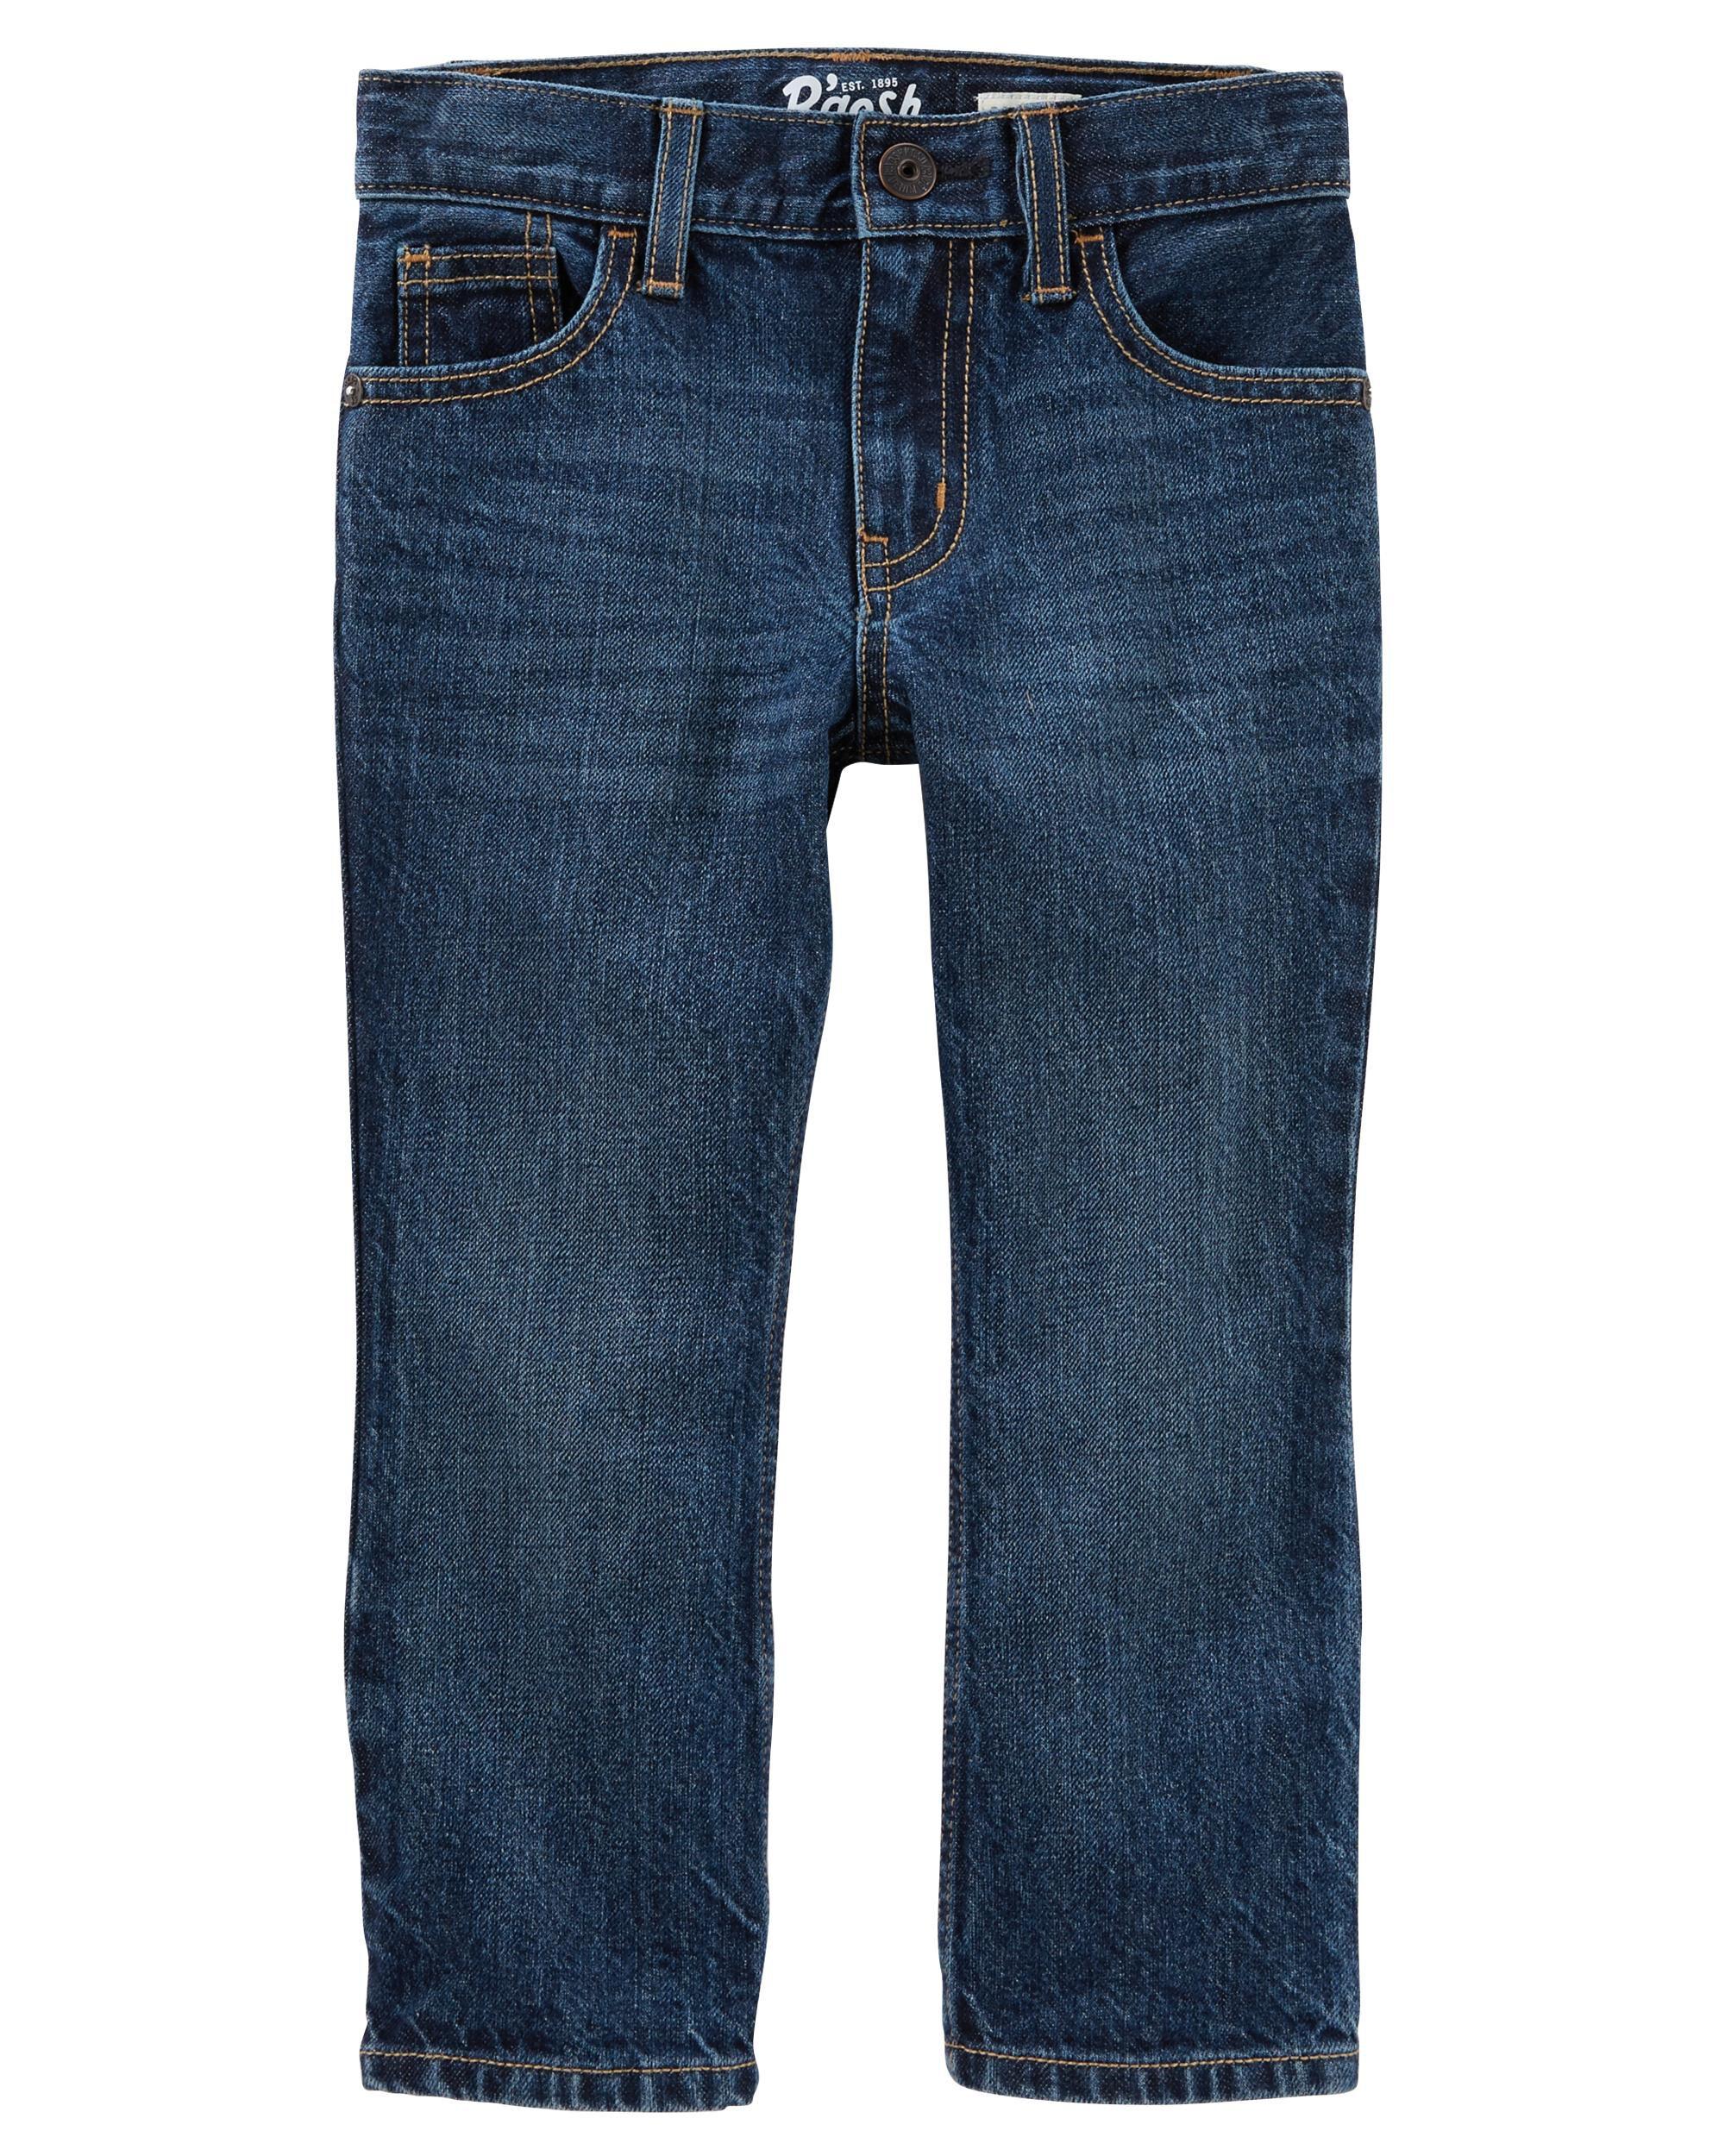 Bootcut Jeans Dark Indigo Wash Oshkosh Com